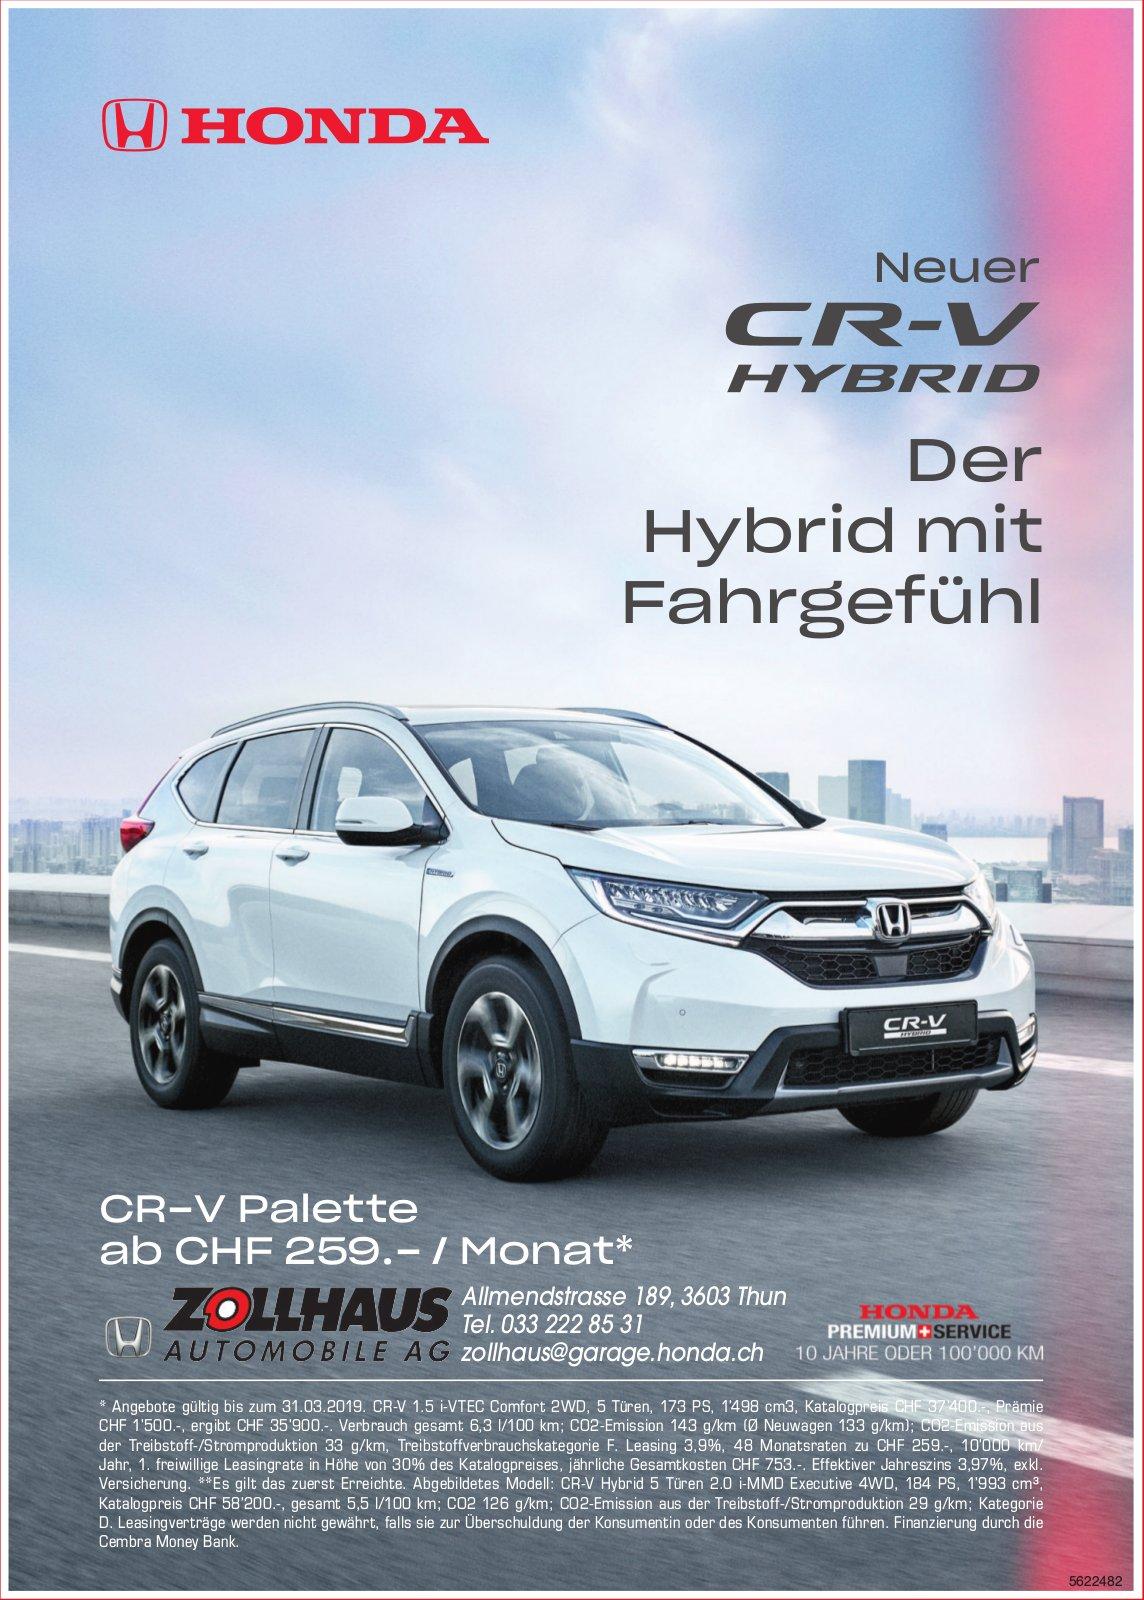 Zollhaus Automobile AG - Neuer HONDA CR-V Hybrid: Der Hybrid mit Fahrgefühl